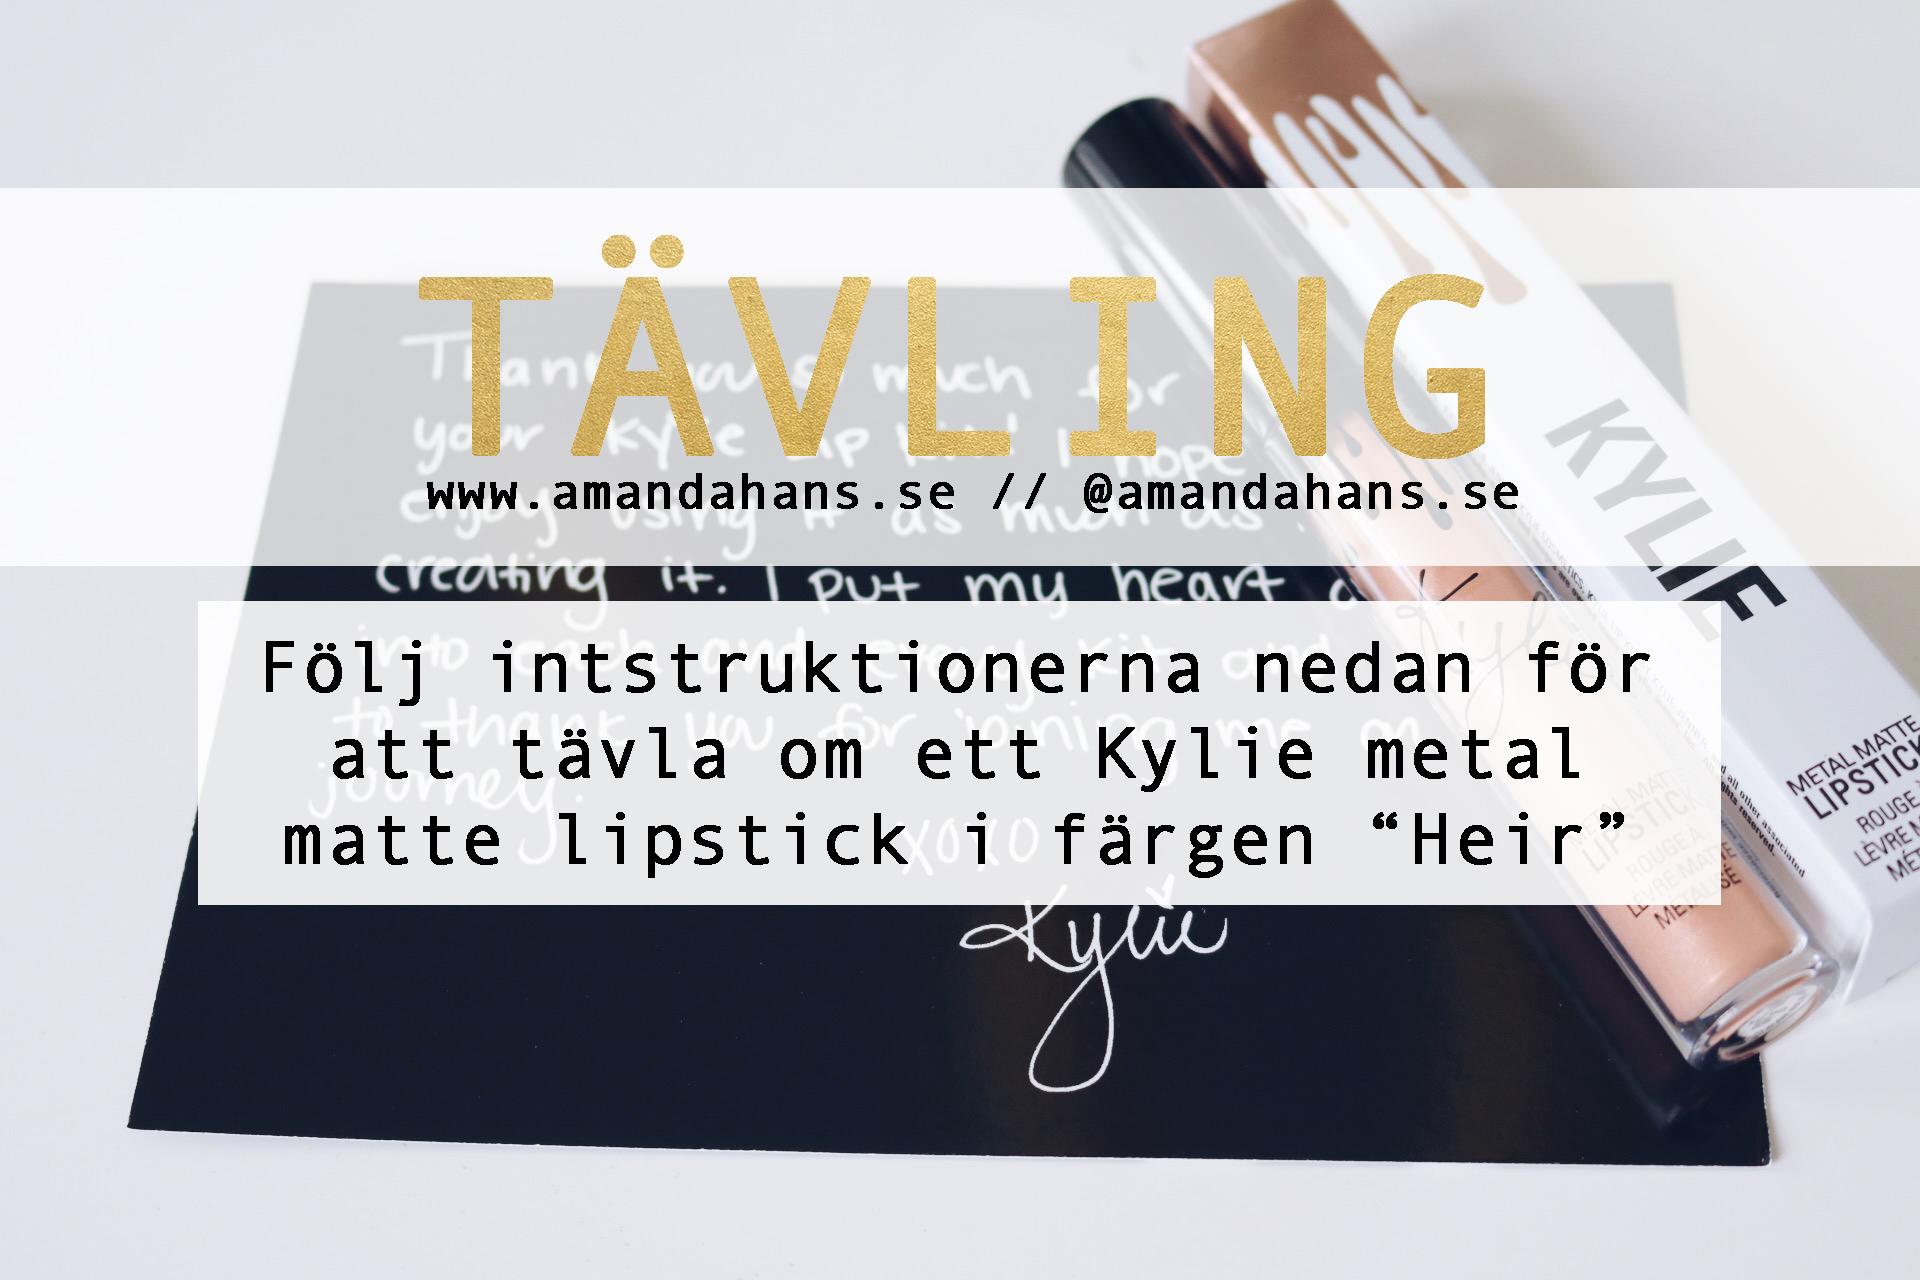 Vinn ett metal matte lipstick från Kylie tävling kylie kosmetiks skönhetsblogg skönhetsbloggare amandahans heir swatch